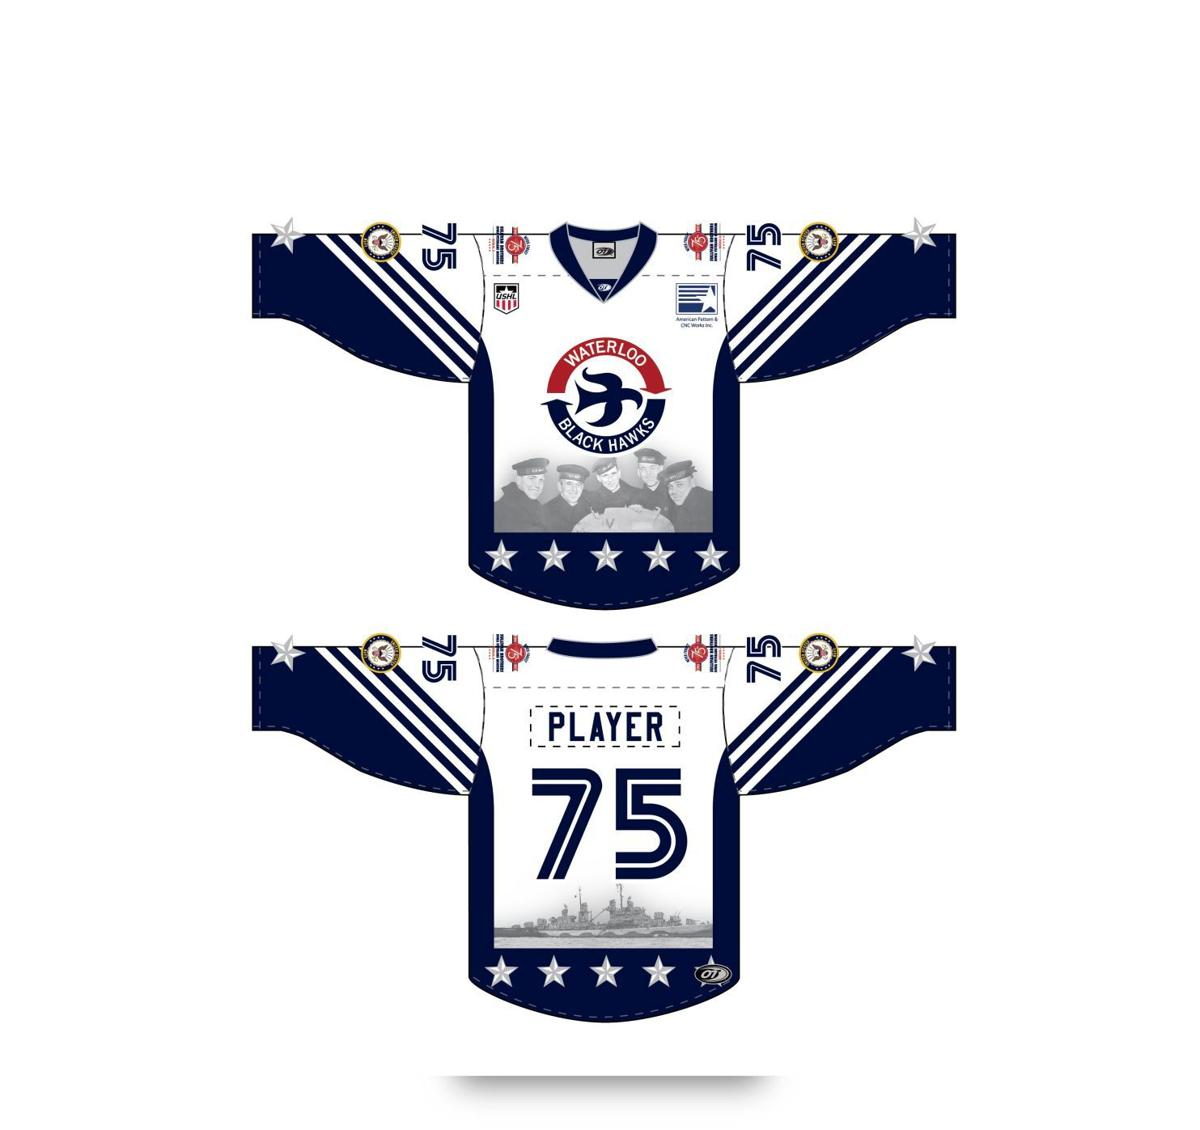 Sullivan Black Hawks hockey jerseys